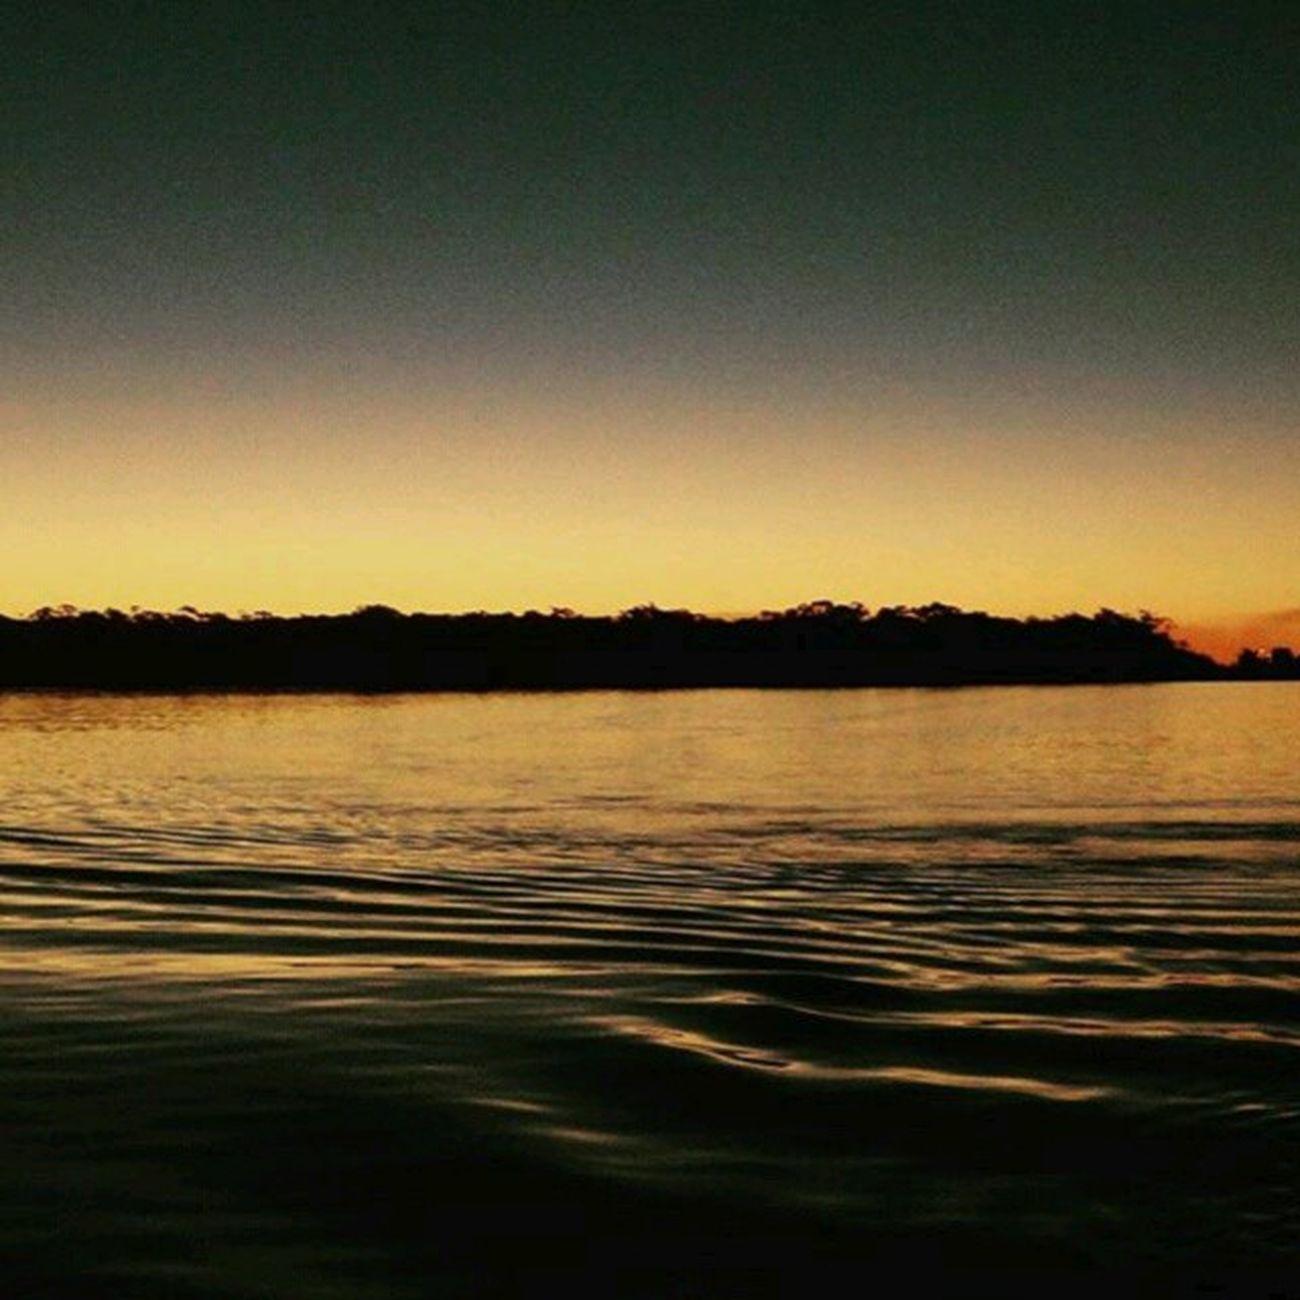 Rio Araguaia - Um gigante Mato-Grossense. Foto: @ccarlos_ribeiro _________________________________ Rioaraguaia Araguaia AraguaiaMT CentroOeste Bresil  Brasil Brazil Brazilien Southamerica VisitBrazil IloveBrazil MatoGrosso_Brasil Matogrosso Travel VejaMatoGrosso MtcomVc World BR MT Magnifique